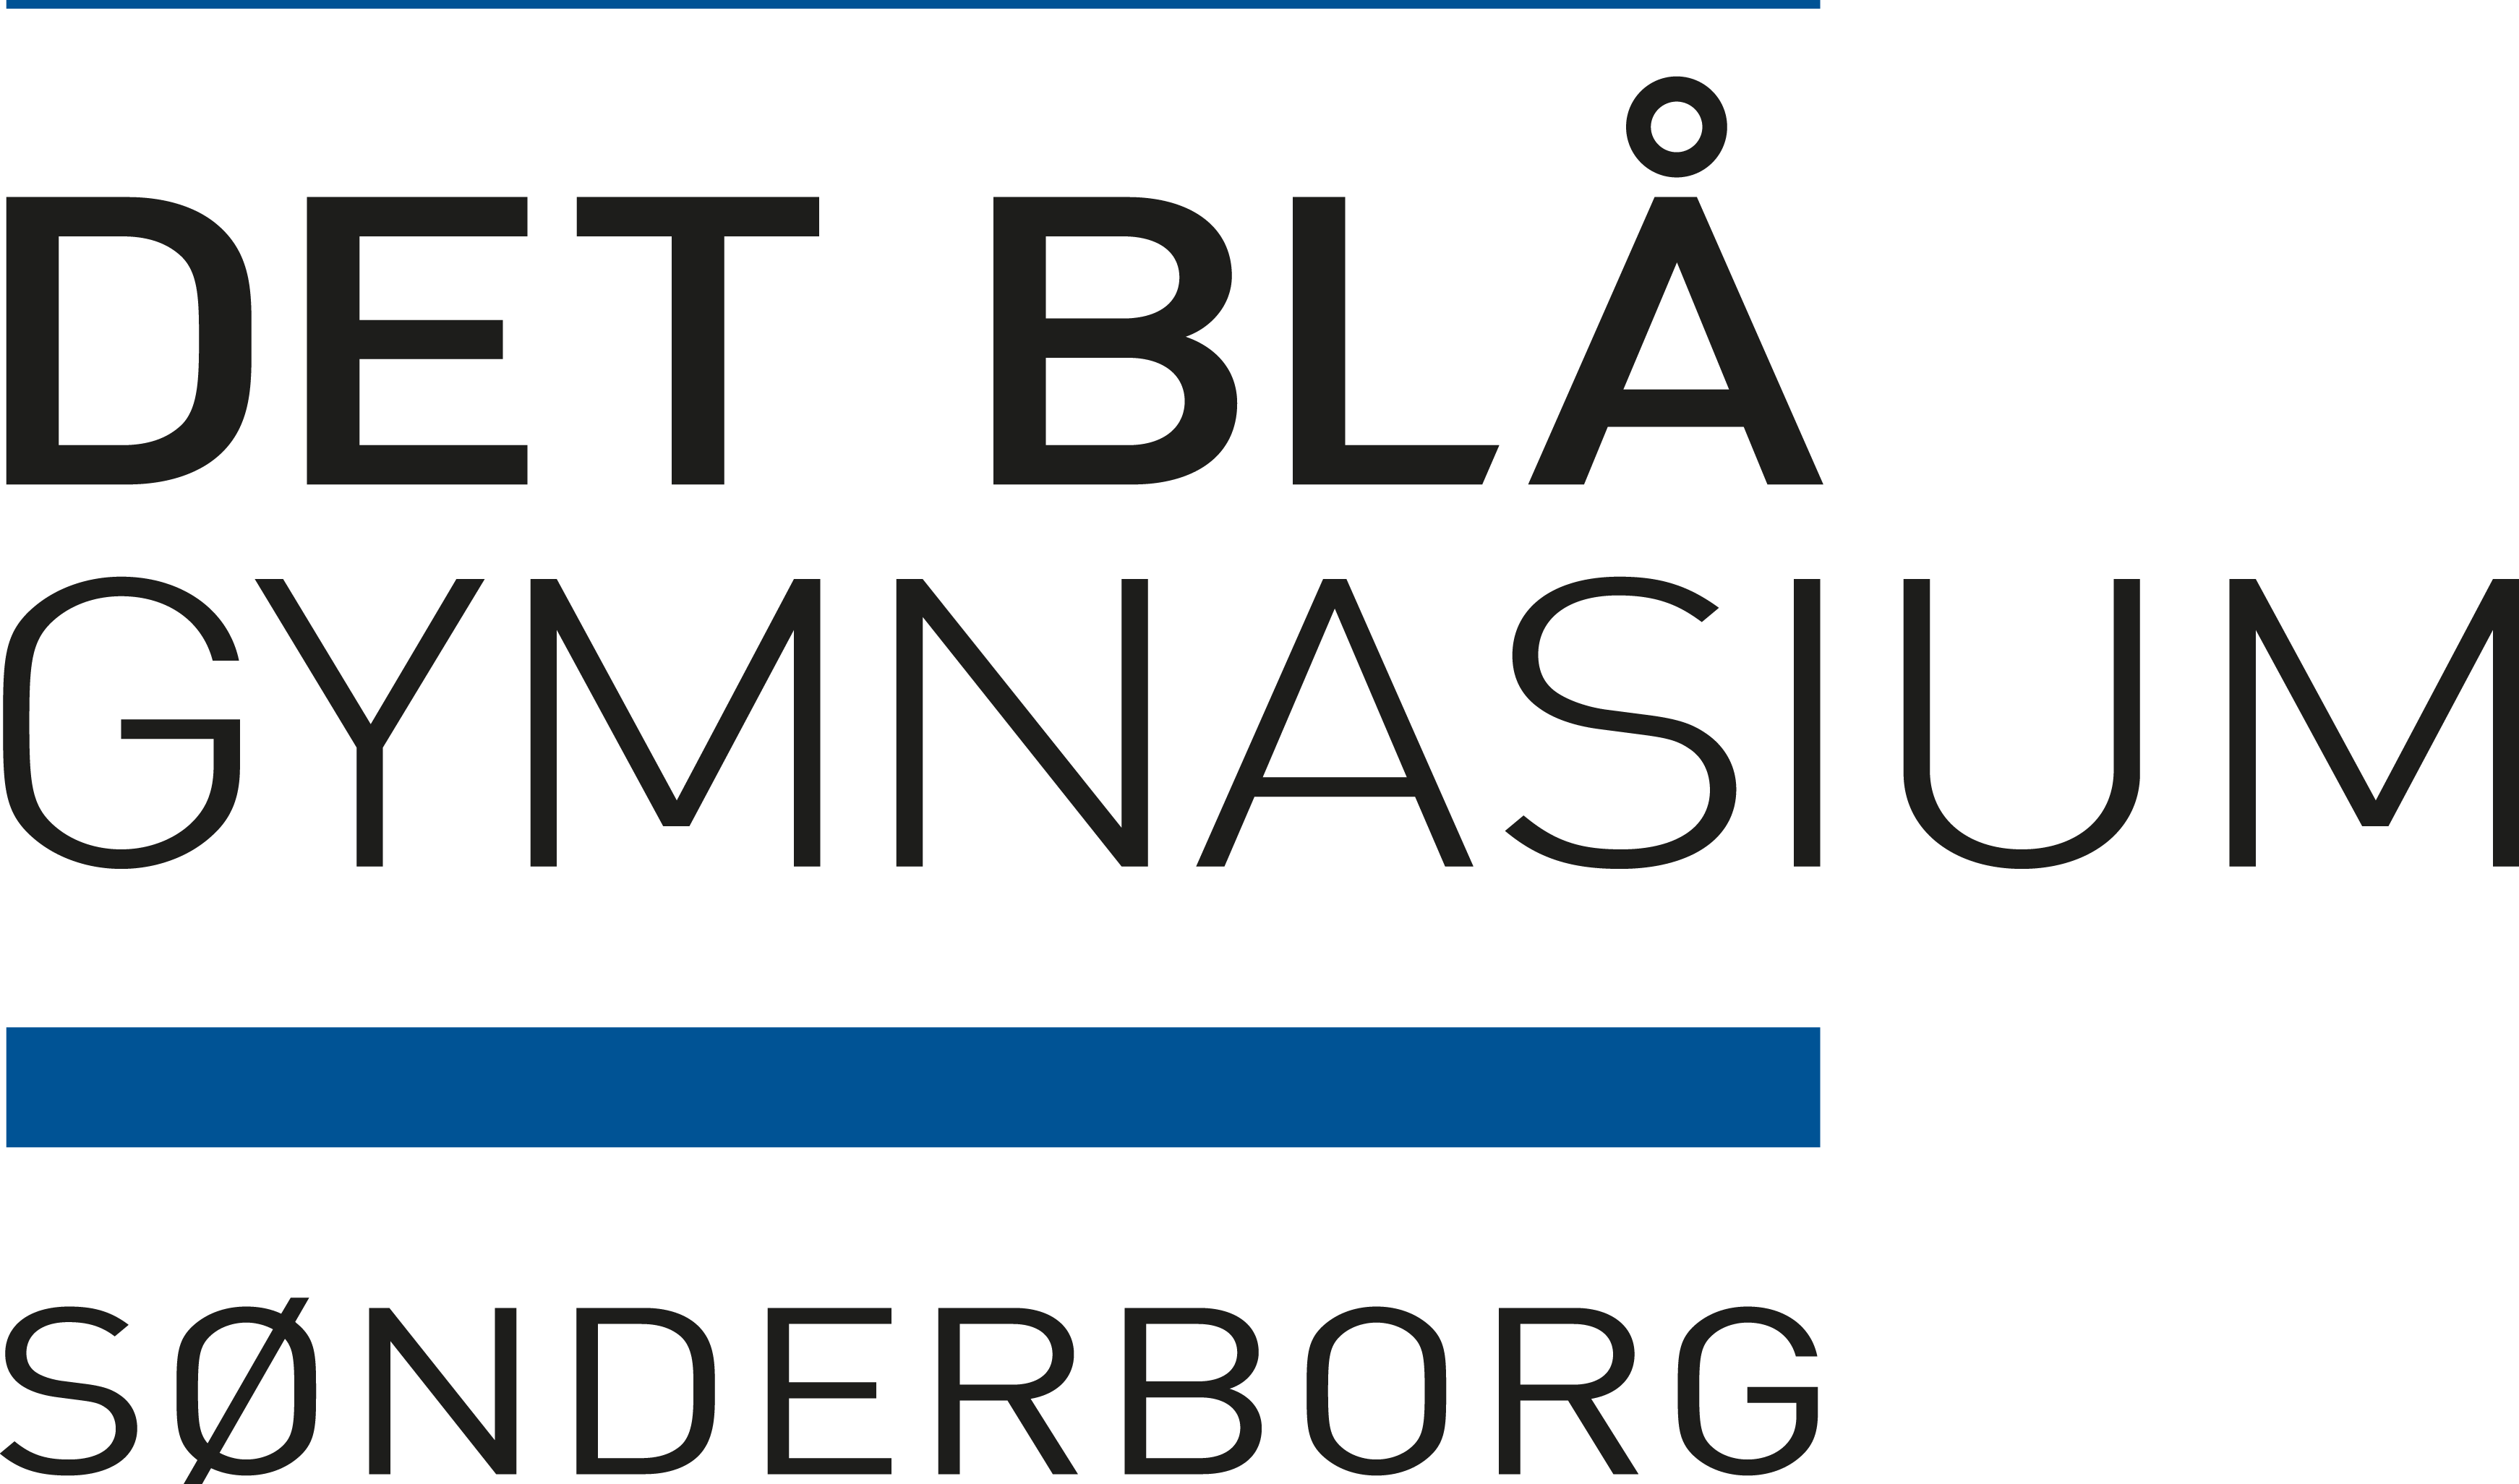 Det_blå_gymnasium logo